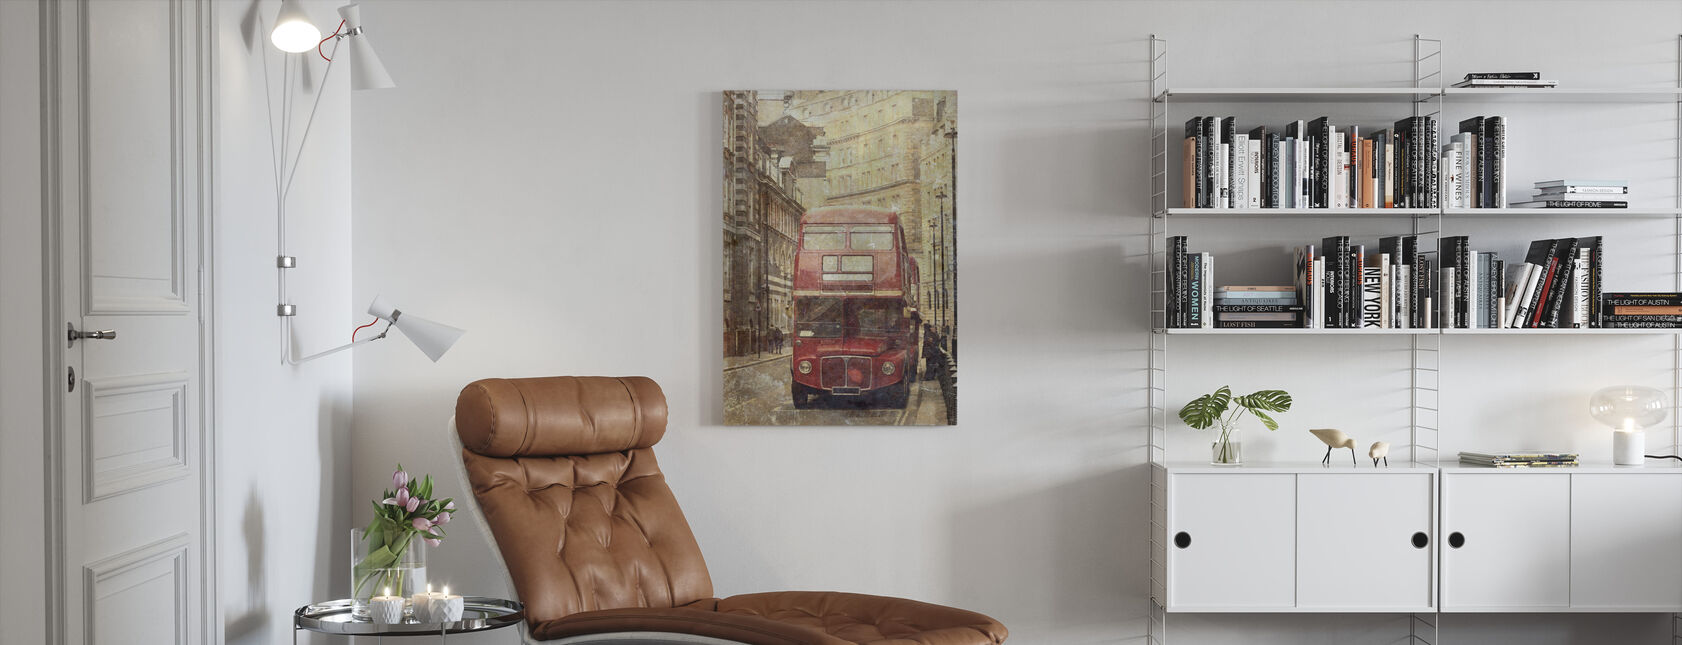 Lontoon bussireitti 9 - Canvastaulu - Olohuone